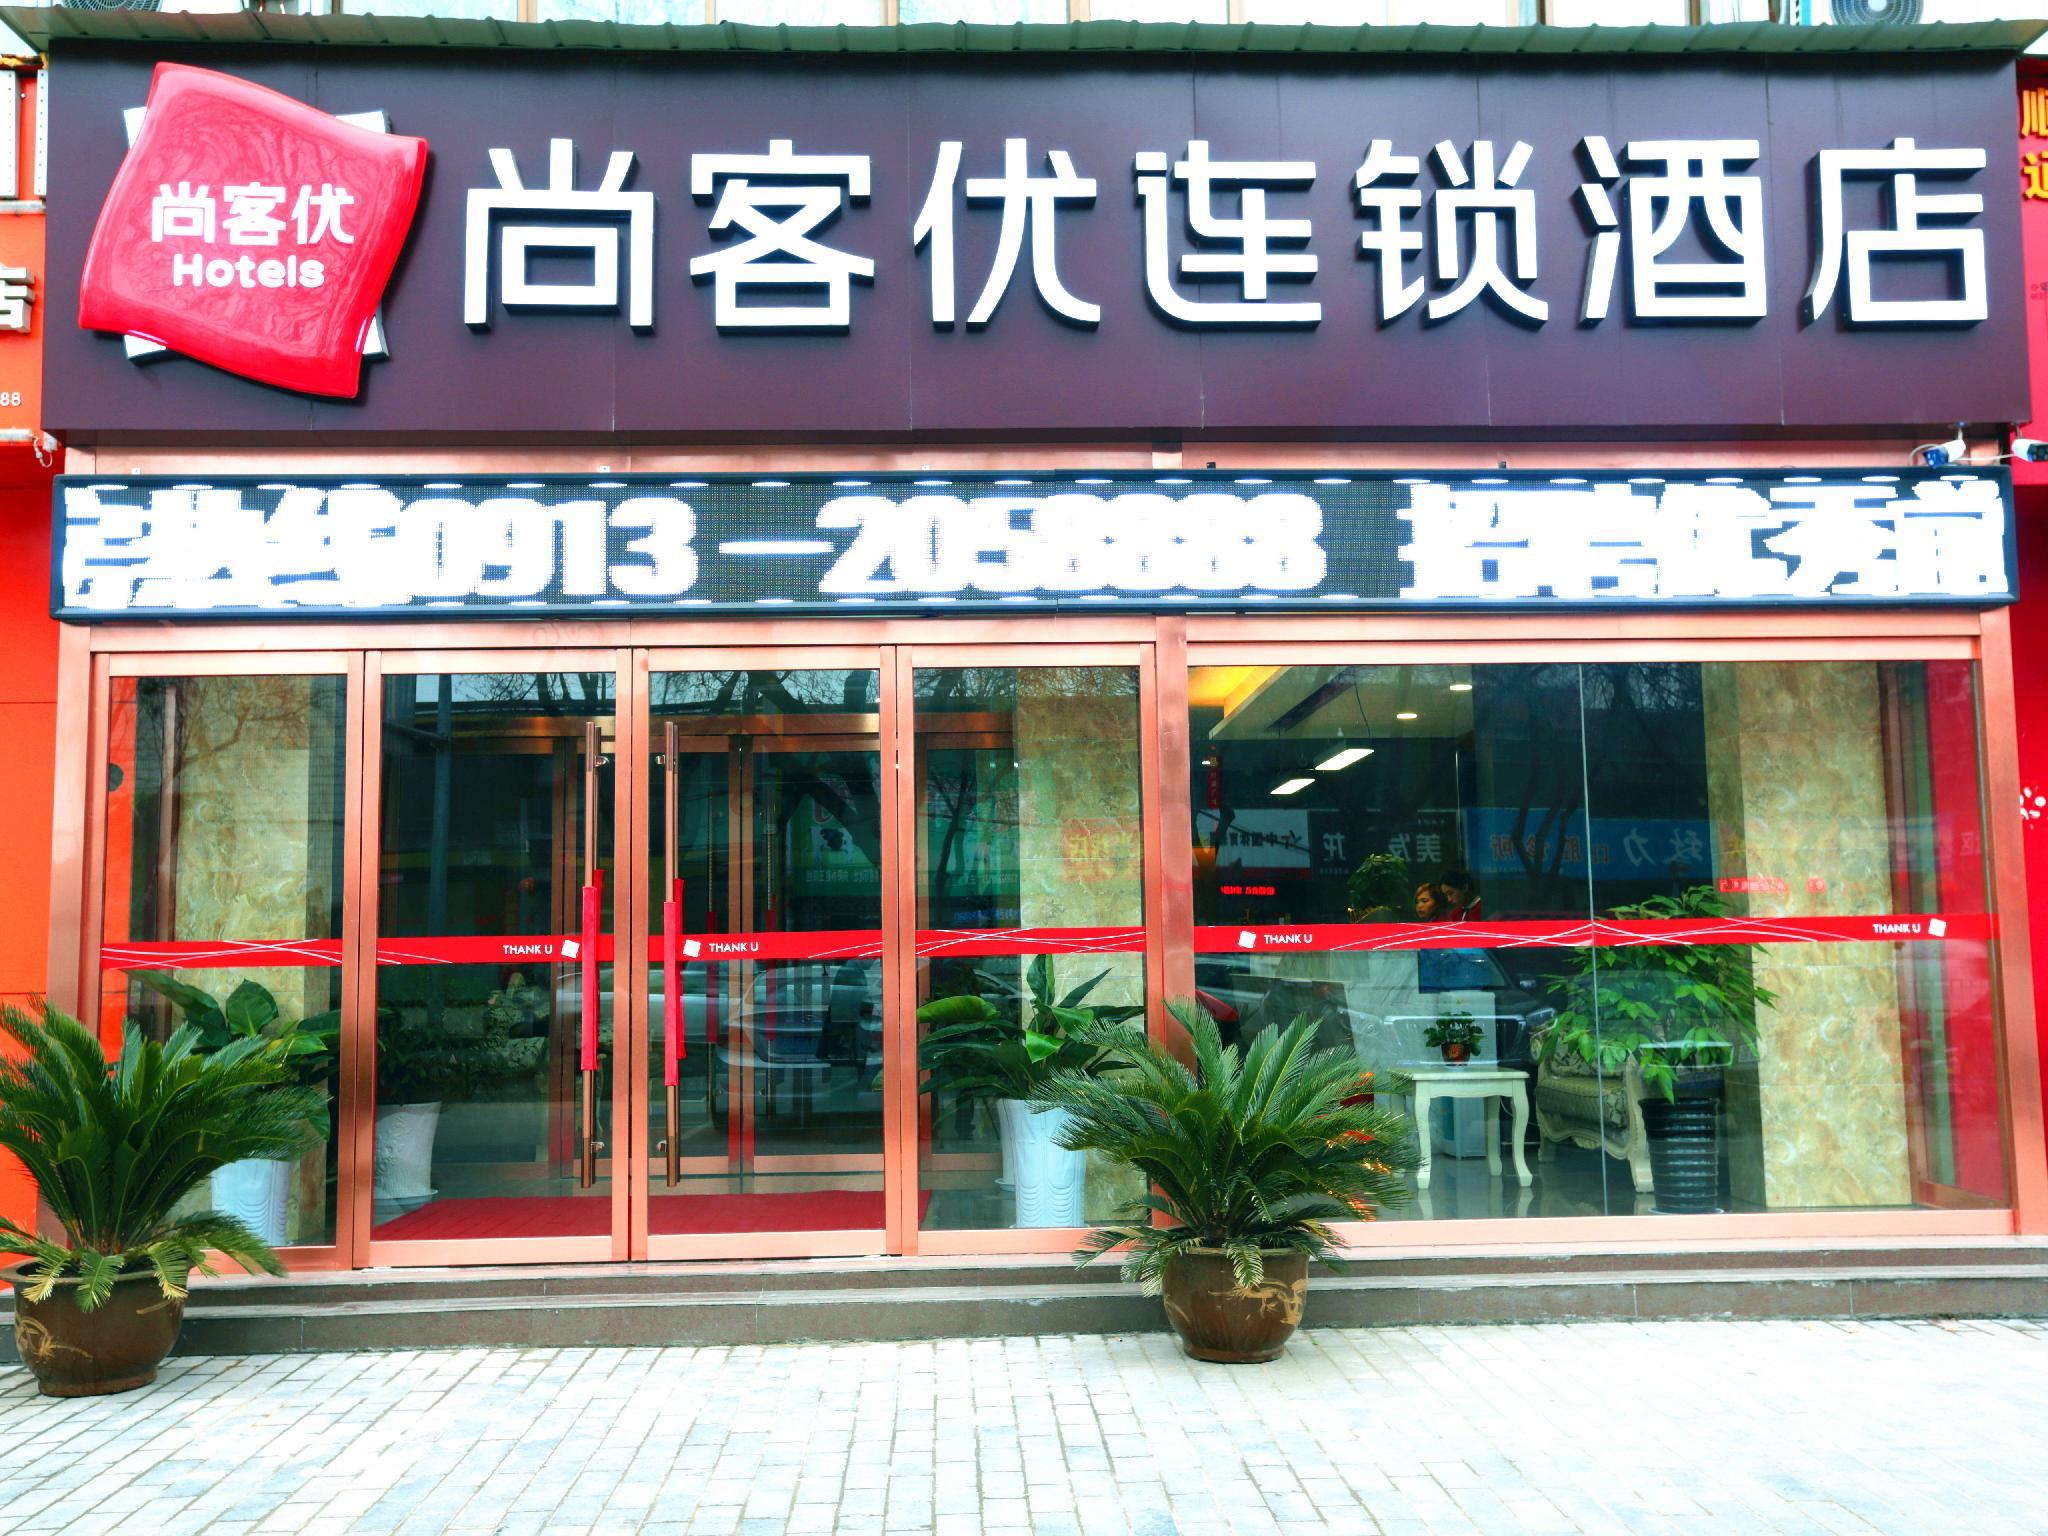 Thank Inn Hotel Shanxi Weinan Linwei District Jiefang Road